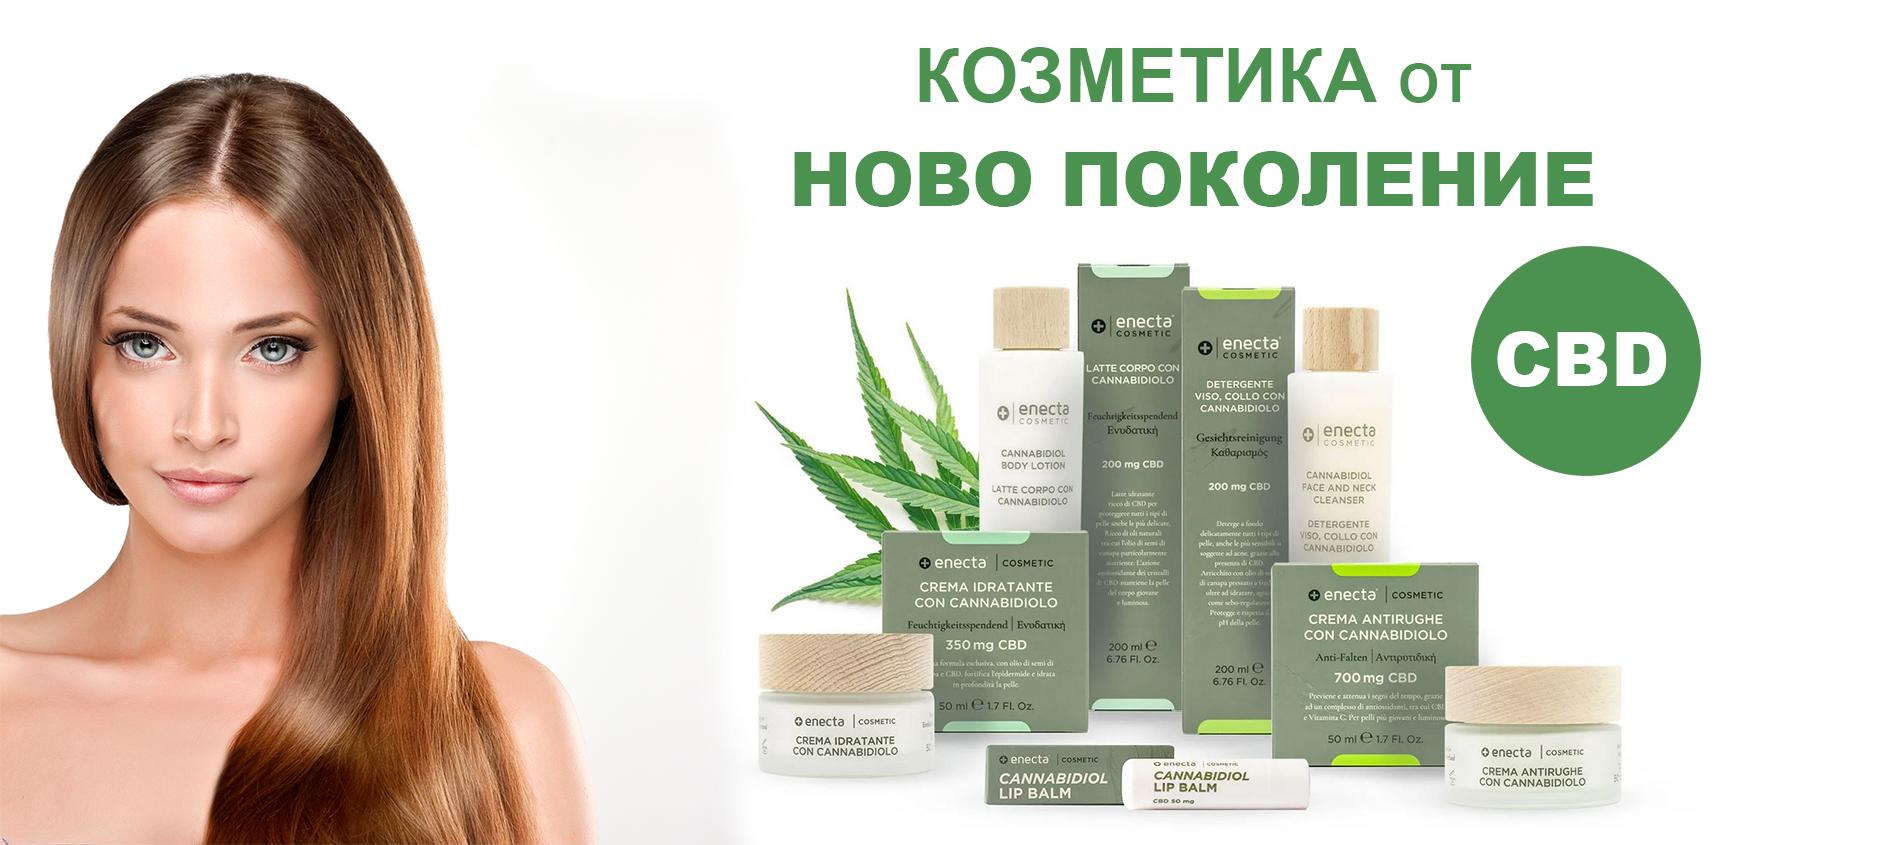 Enecta cosmetics